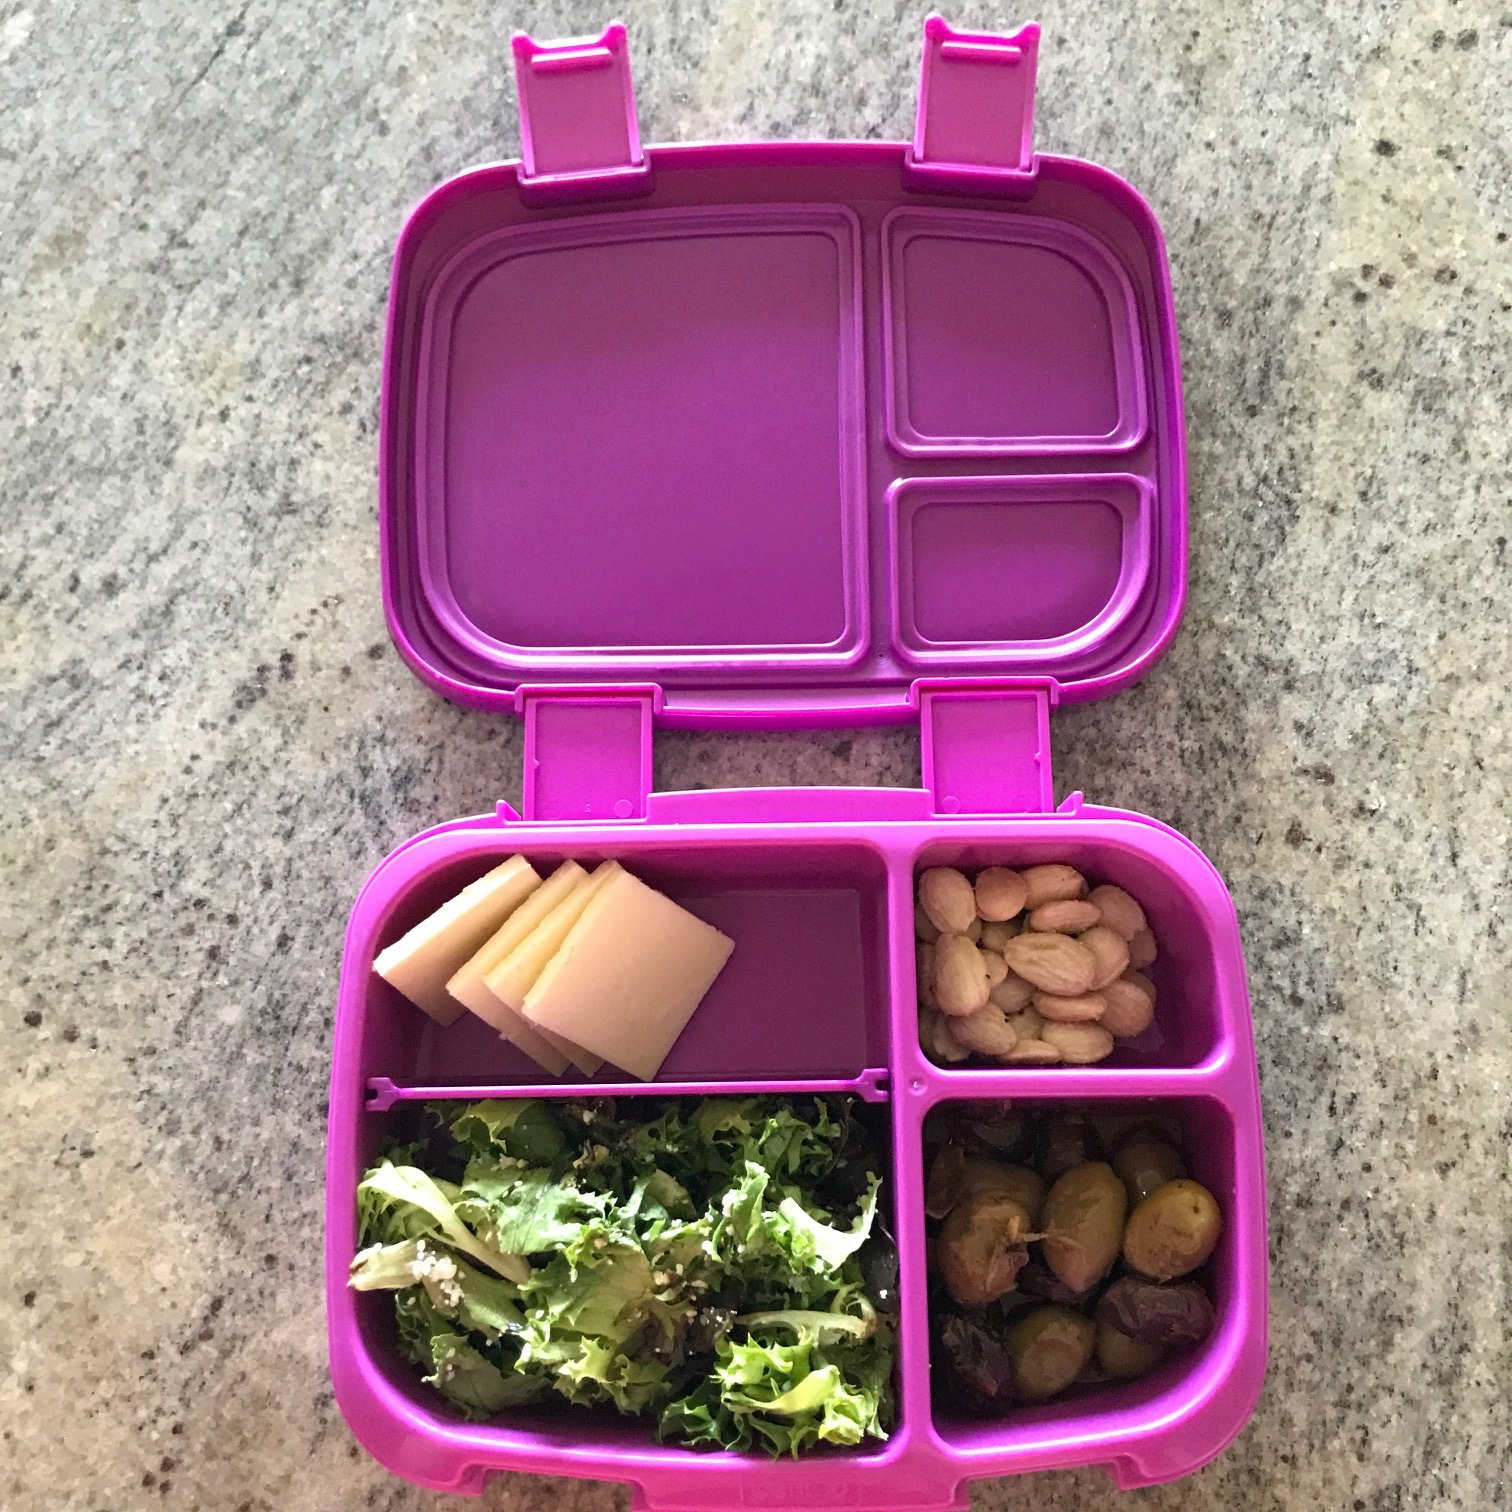 Bentgo Lunch Box - purple